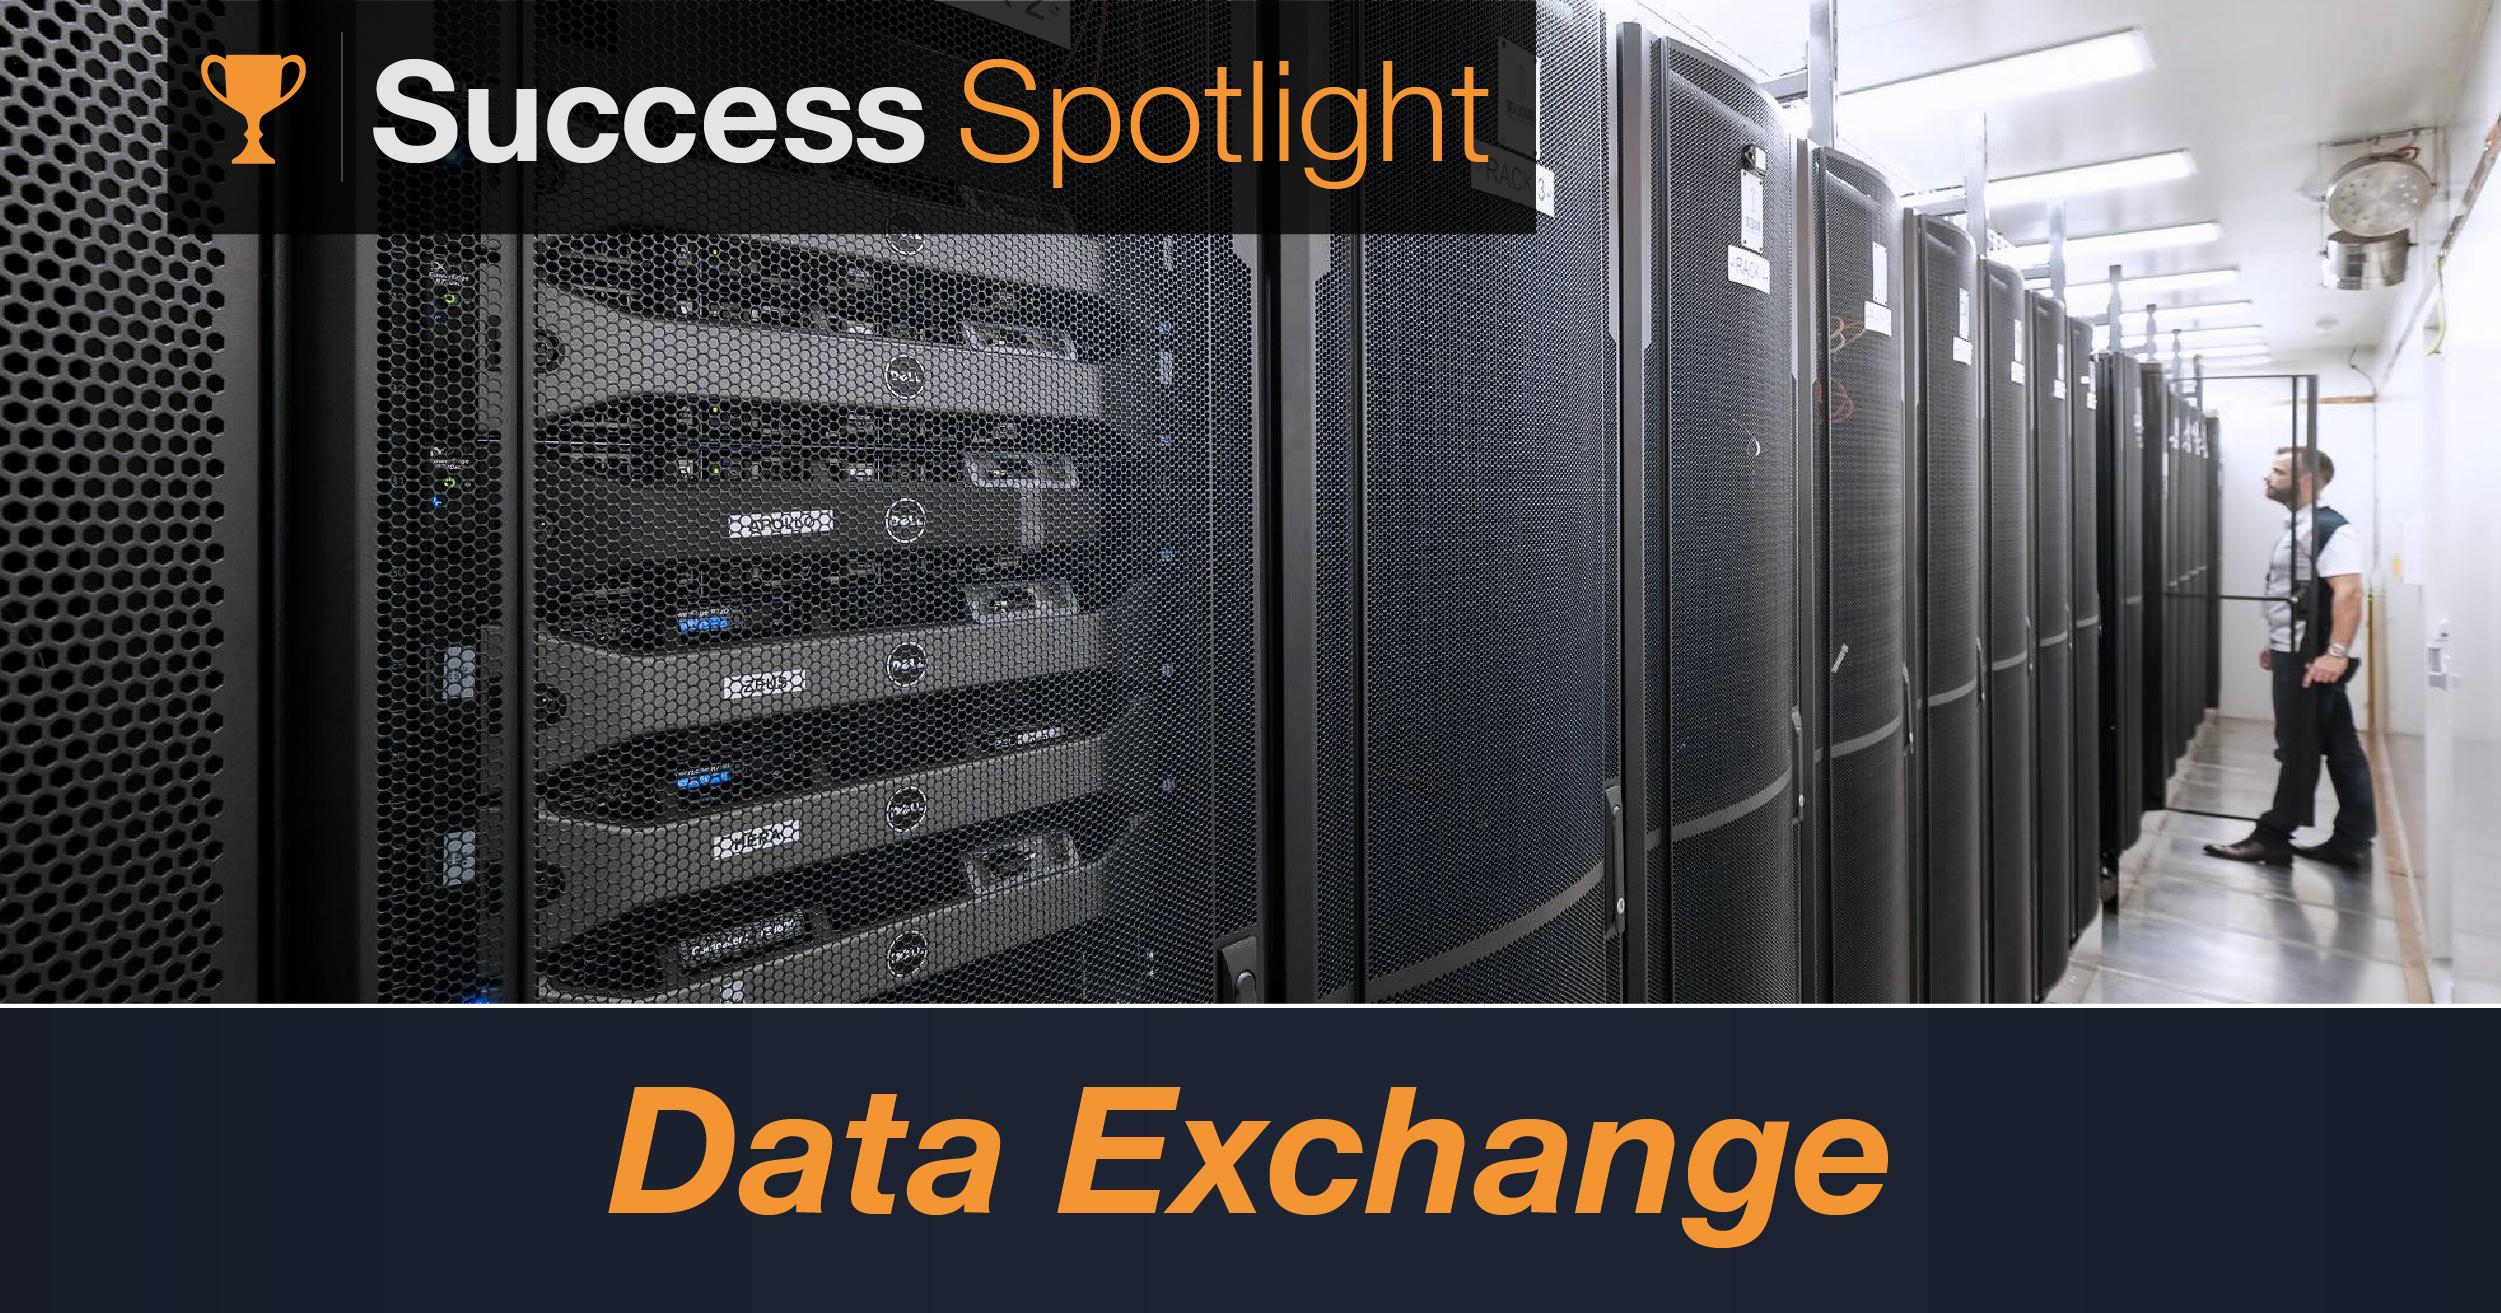 Success Spotlight: Data Exchange